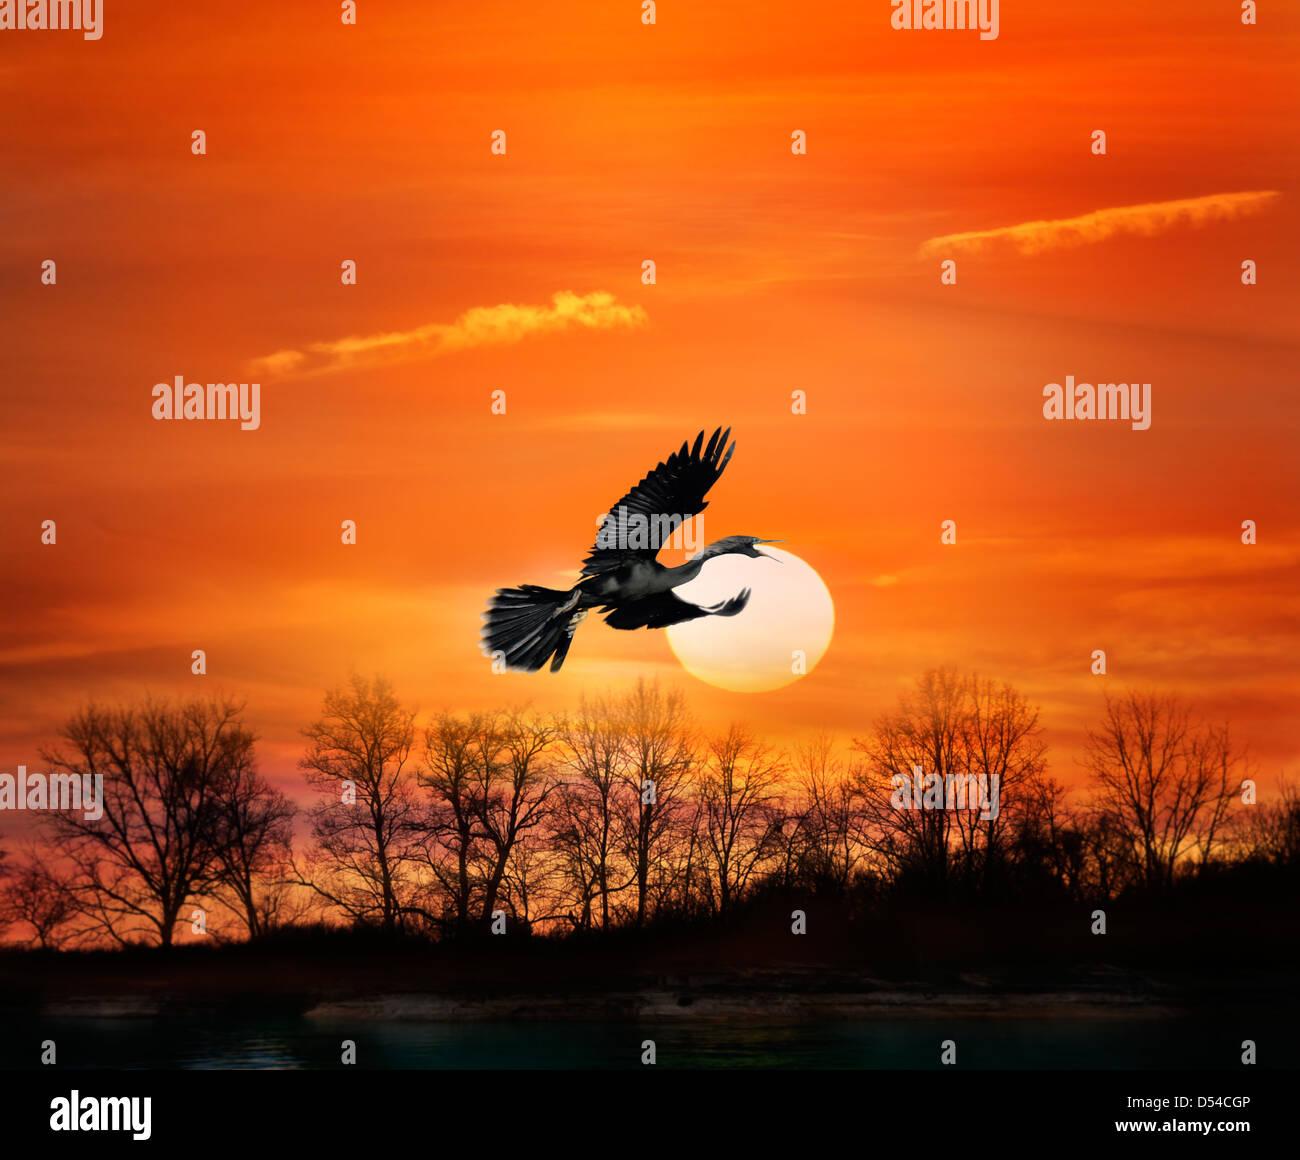 Flying Bird At Sunset - Stock Image